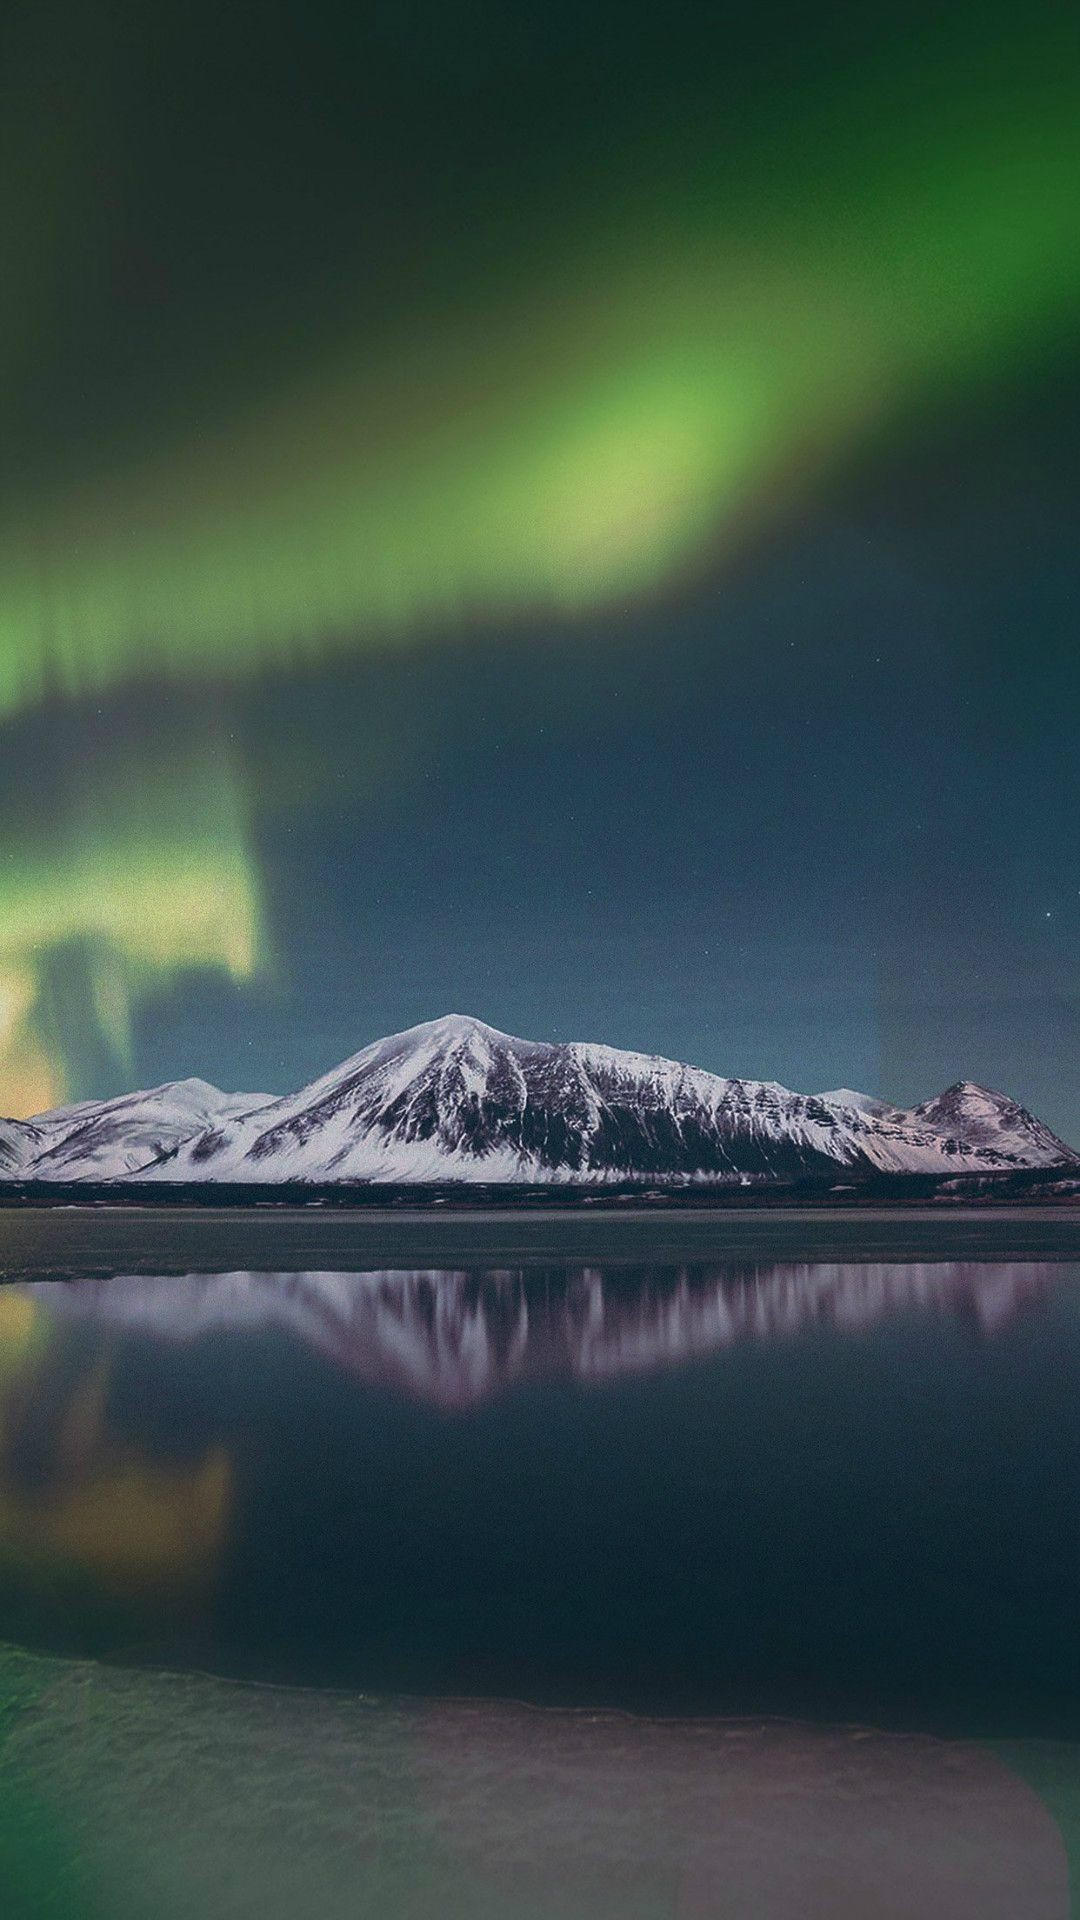 Aurora Night Sky Green Bokeh Instagram Art Nature iPhone 6 .